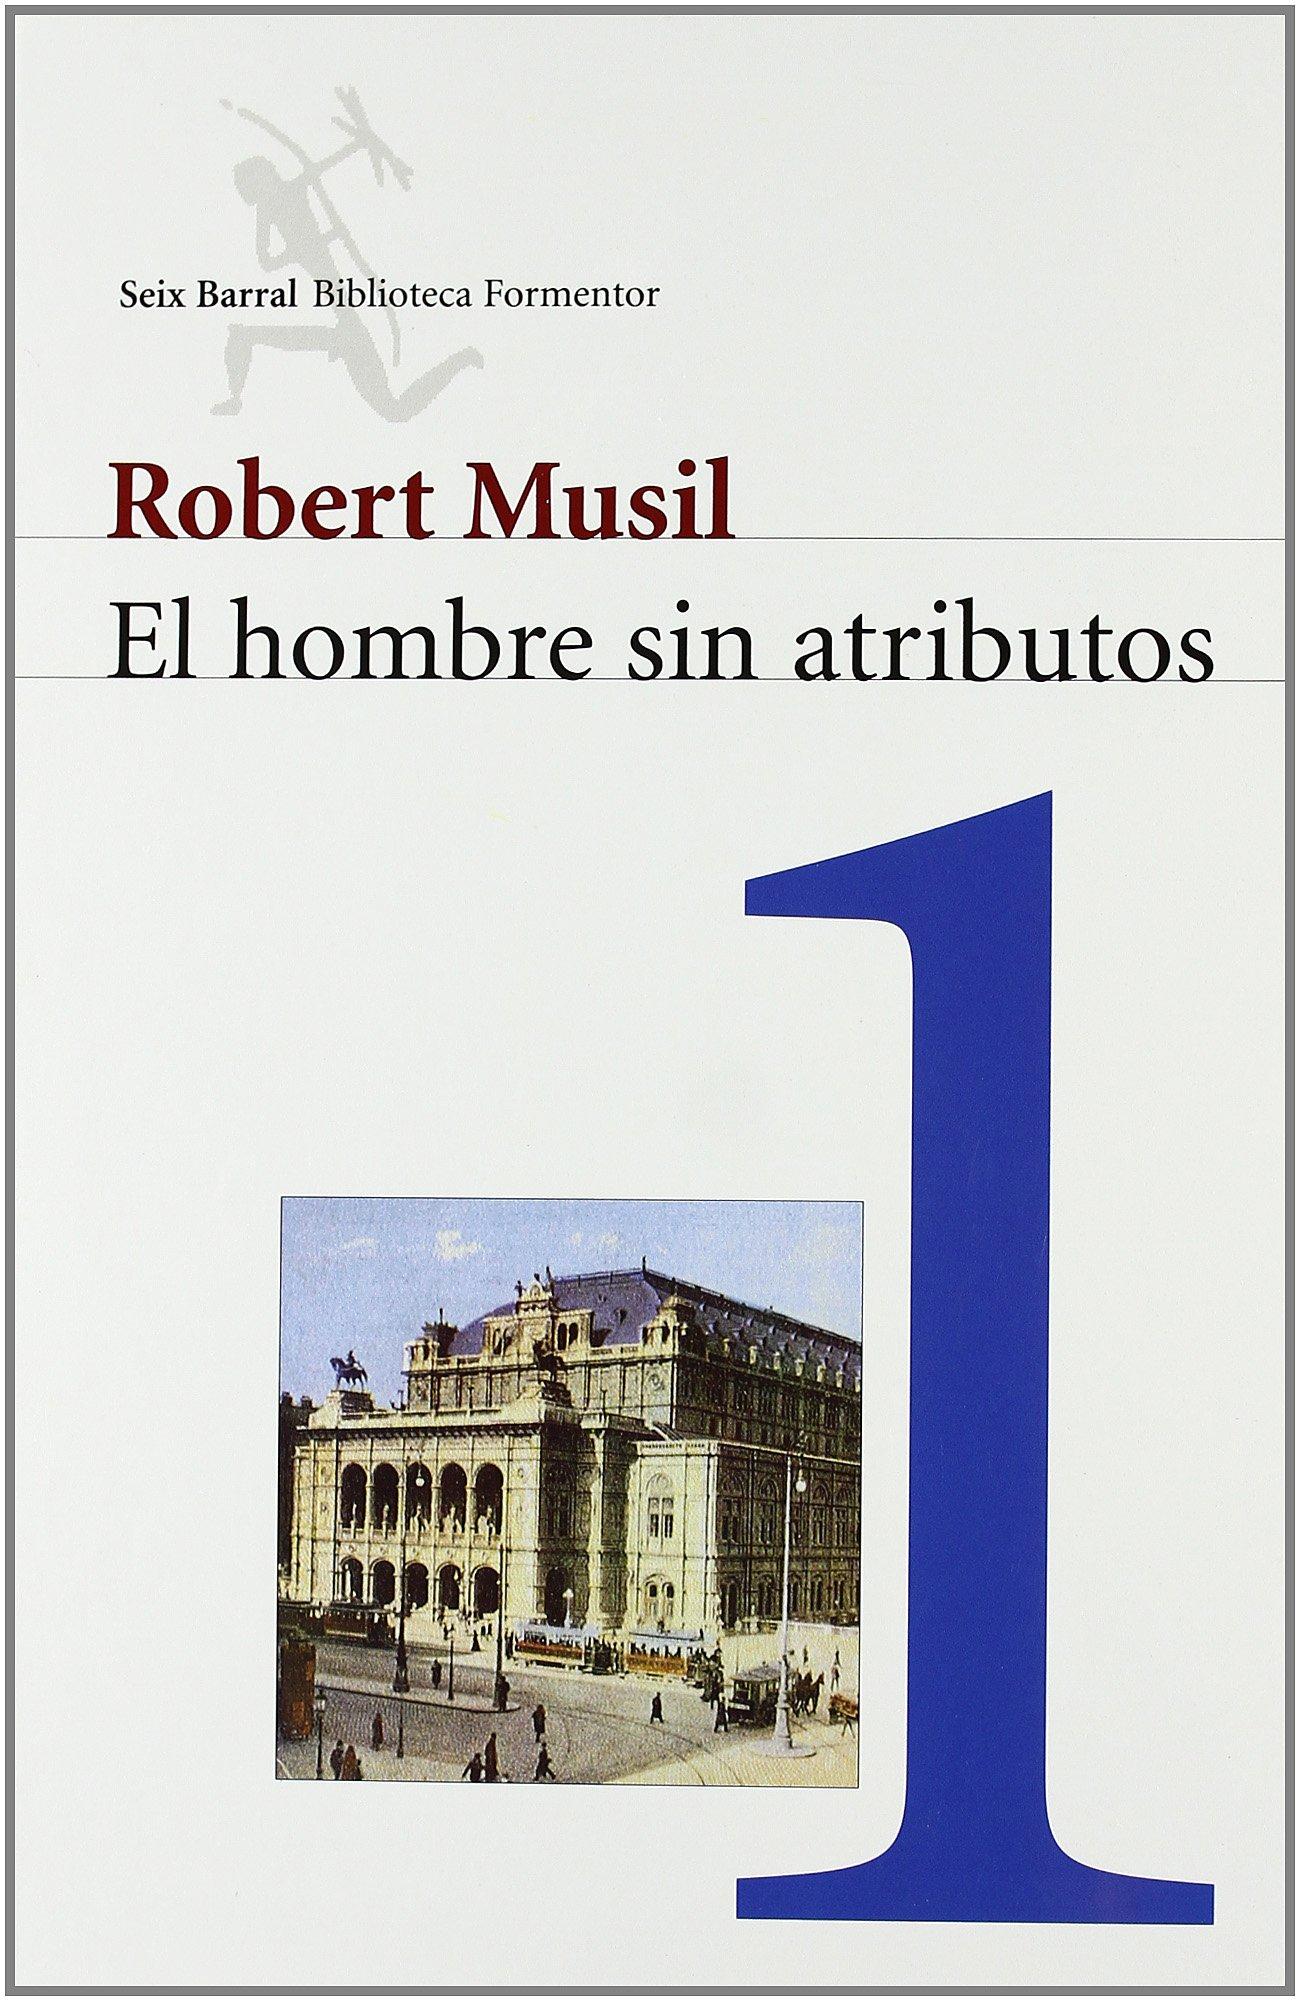 [Descargar] Tres mujeres - Robert Musil en PDF — Libros